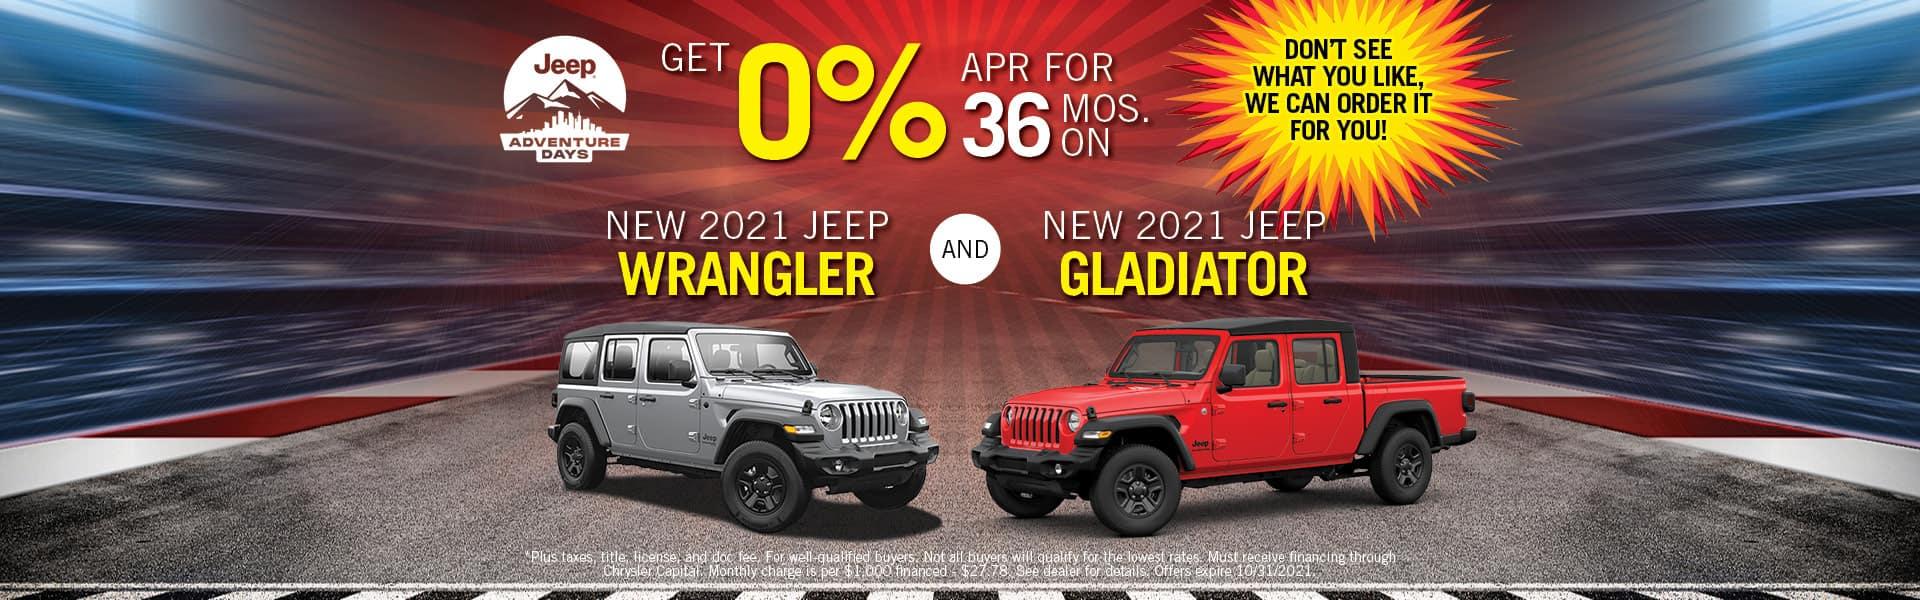 2021 Jeep Wrangler & Gladiator Special Offers- Redlands CDJR